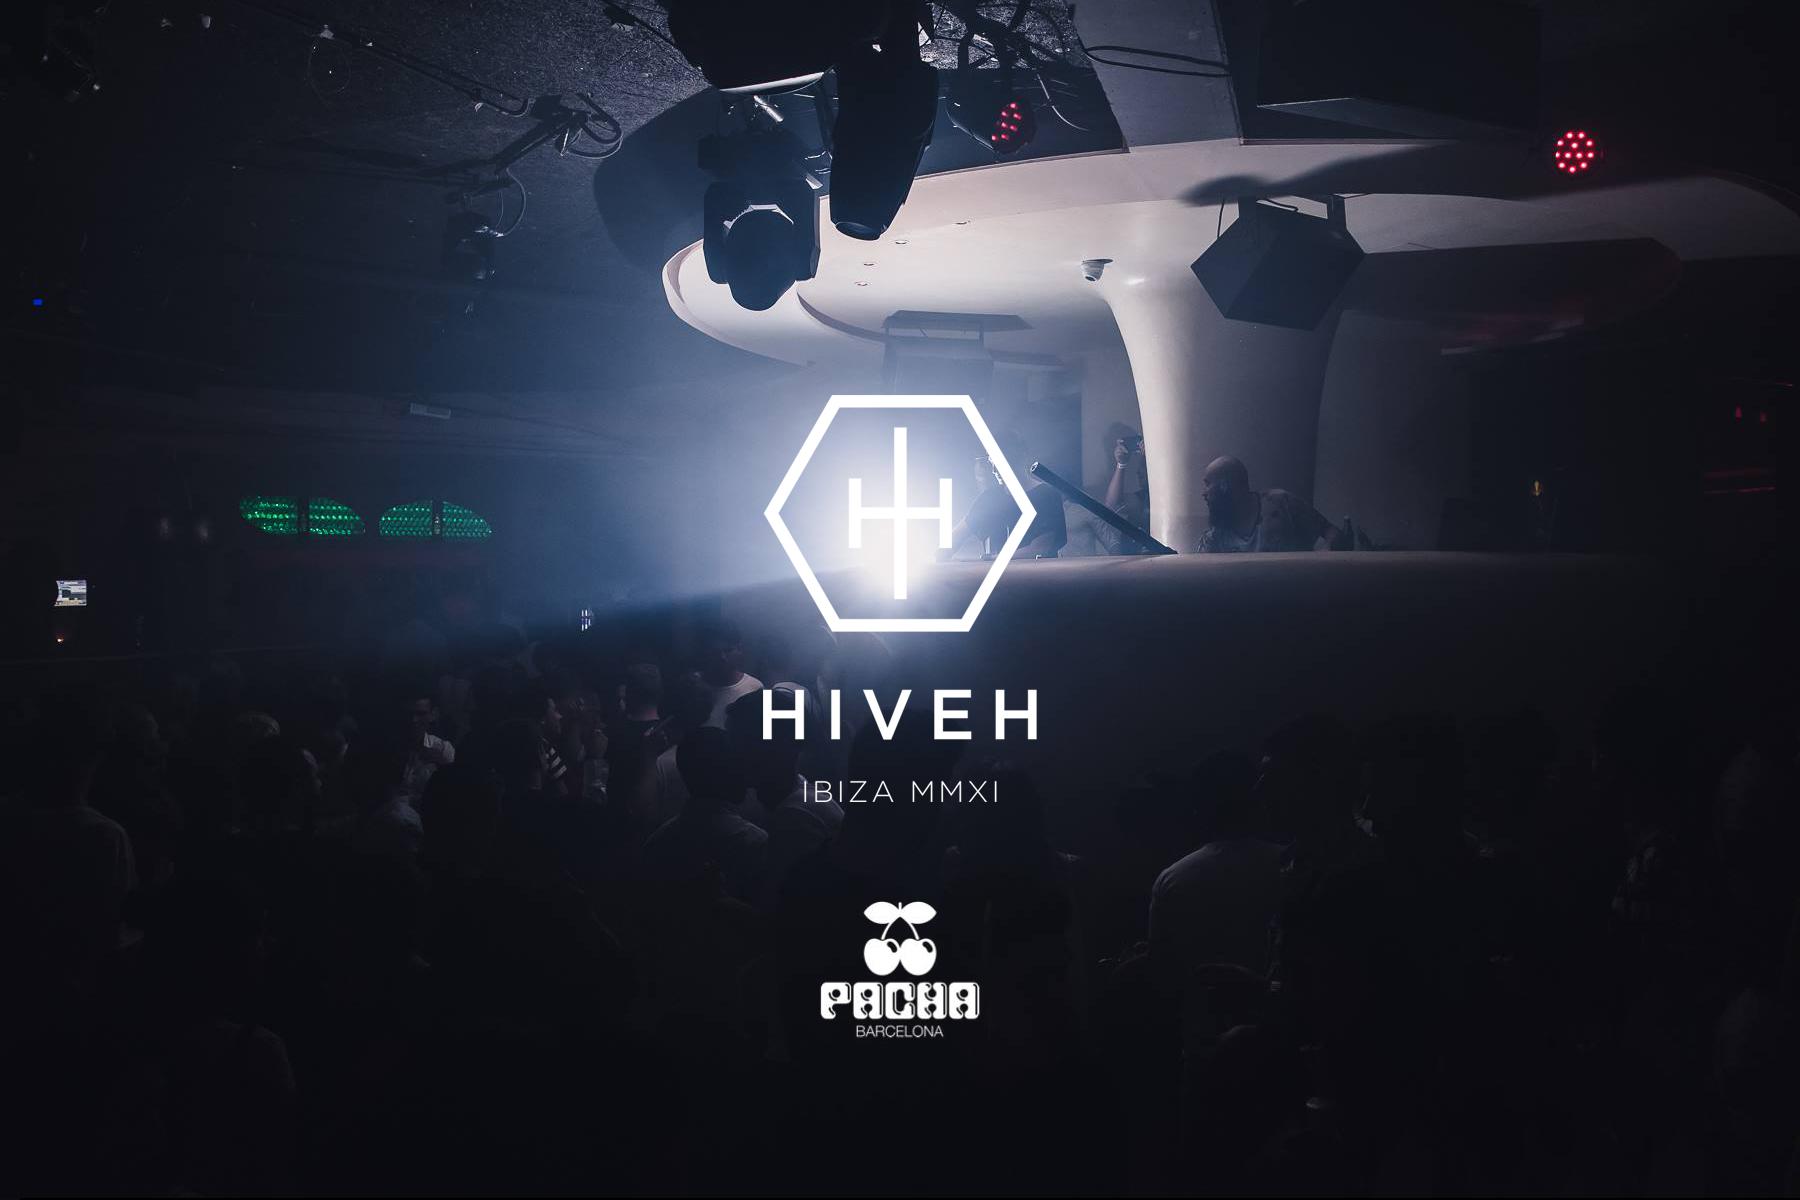 HIVEH; Ibiza Pacha; Andy Ricci